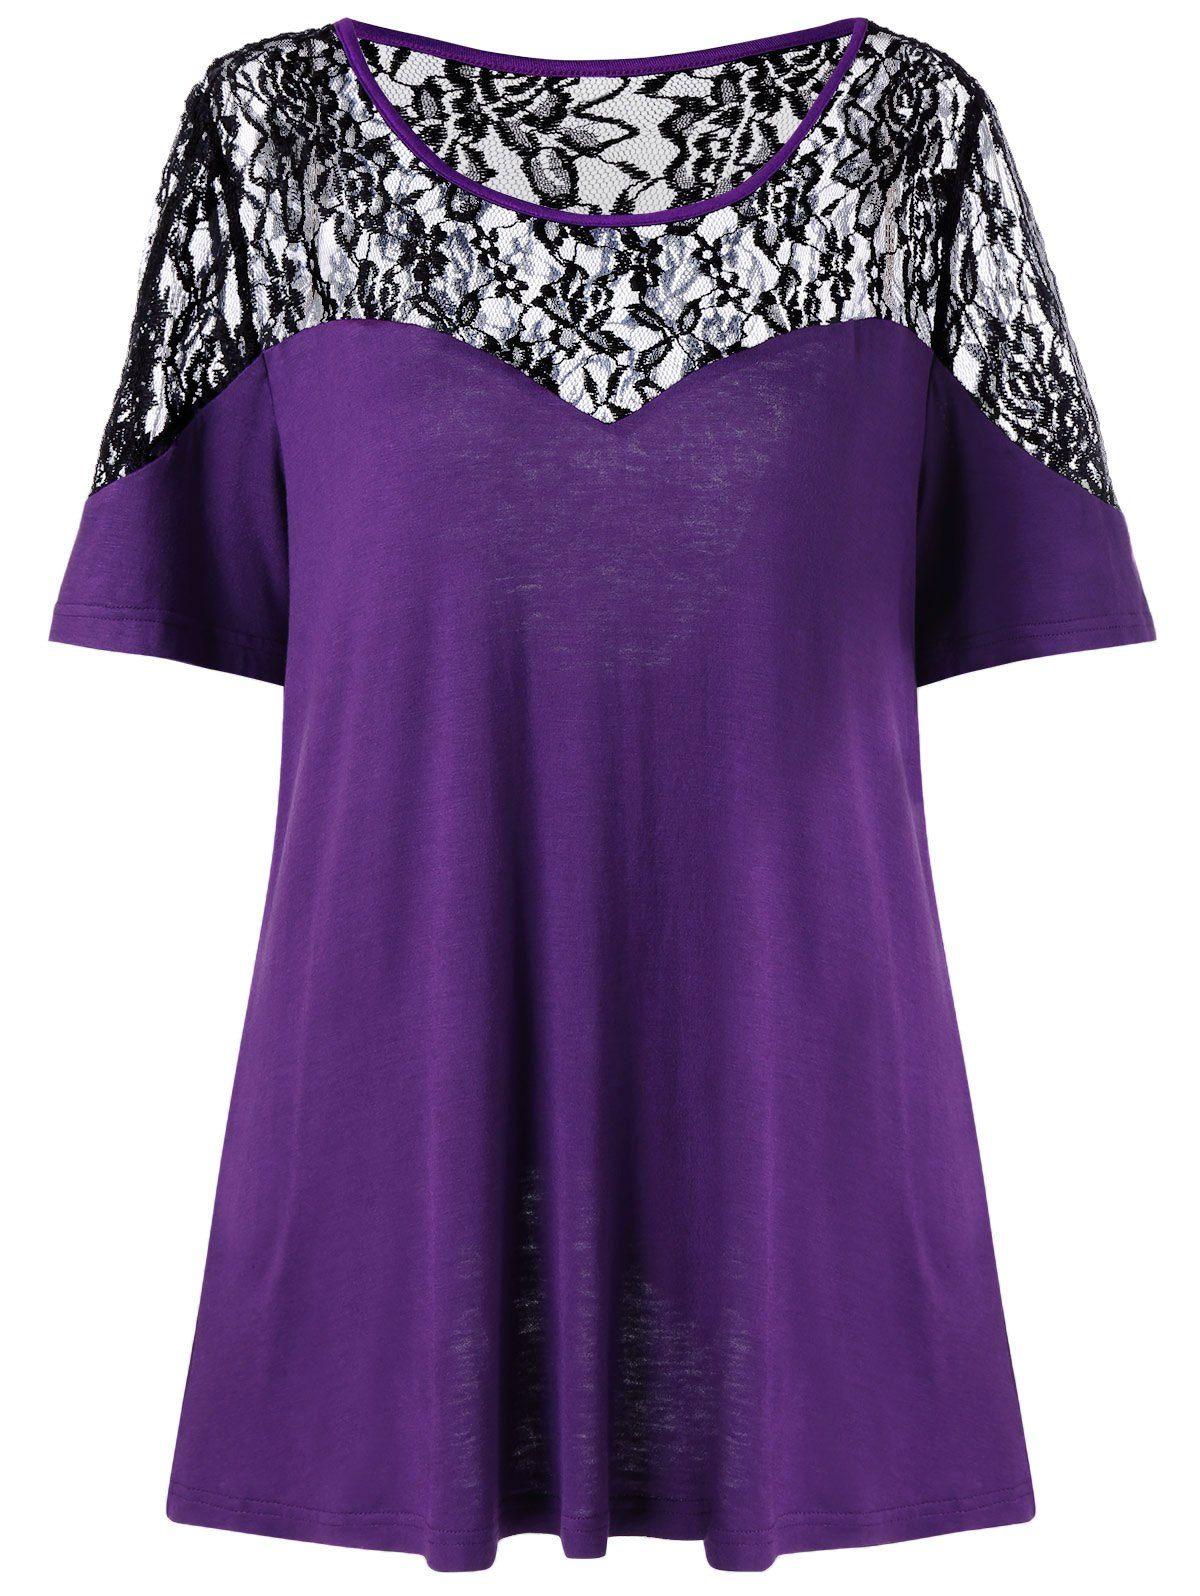 67b39b18d95 Fashion · Plus Size Back Slit Lace Trim T-Shirt - PURPLE 3XL